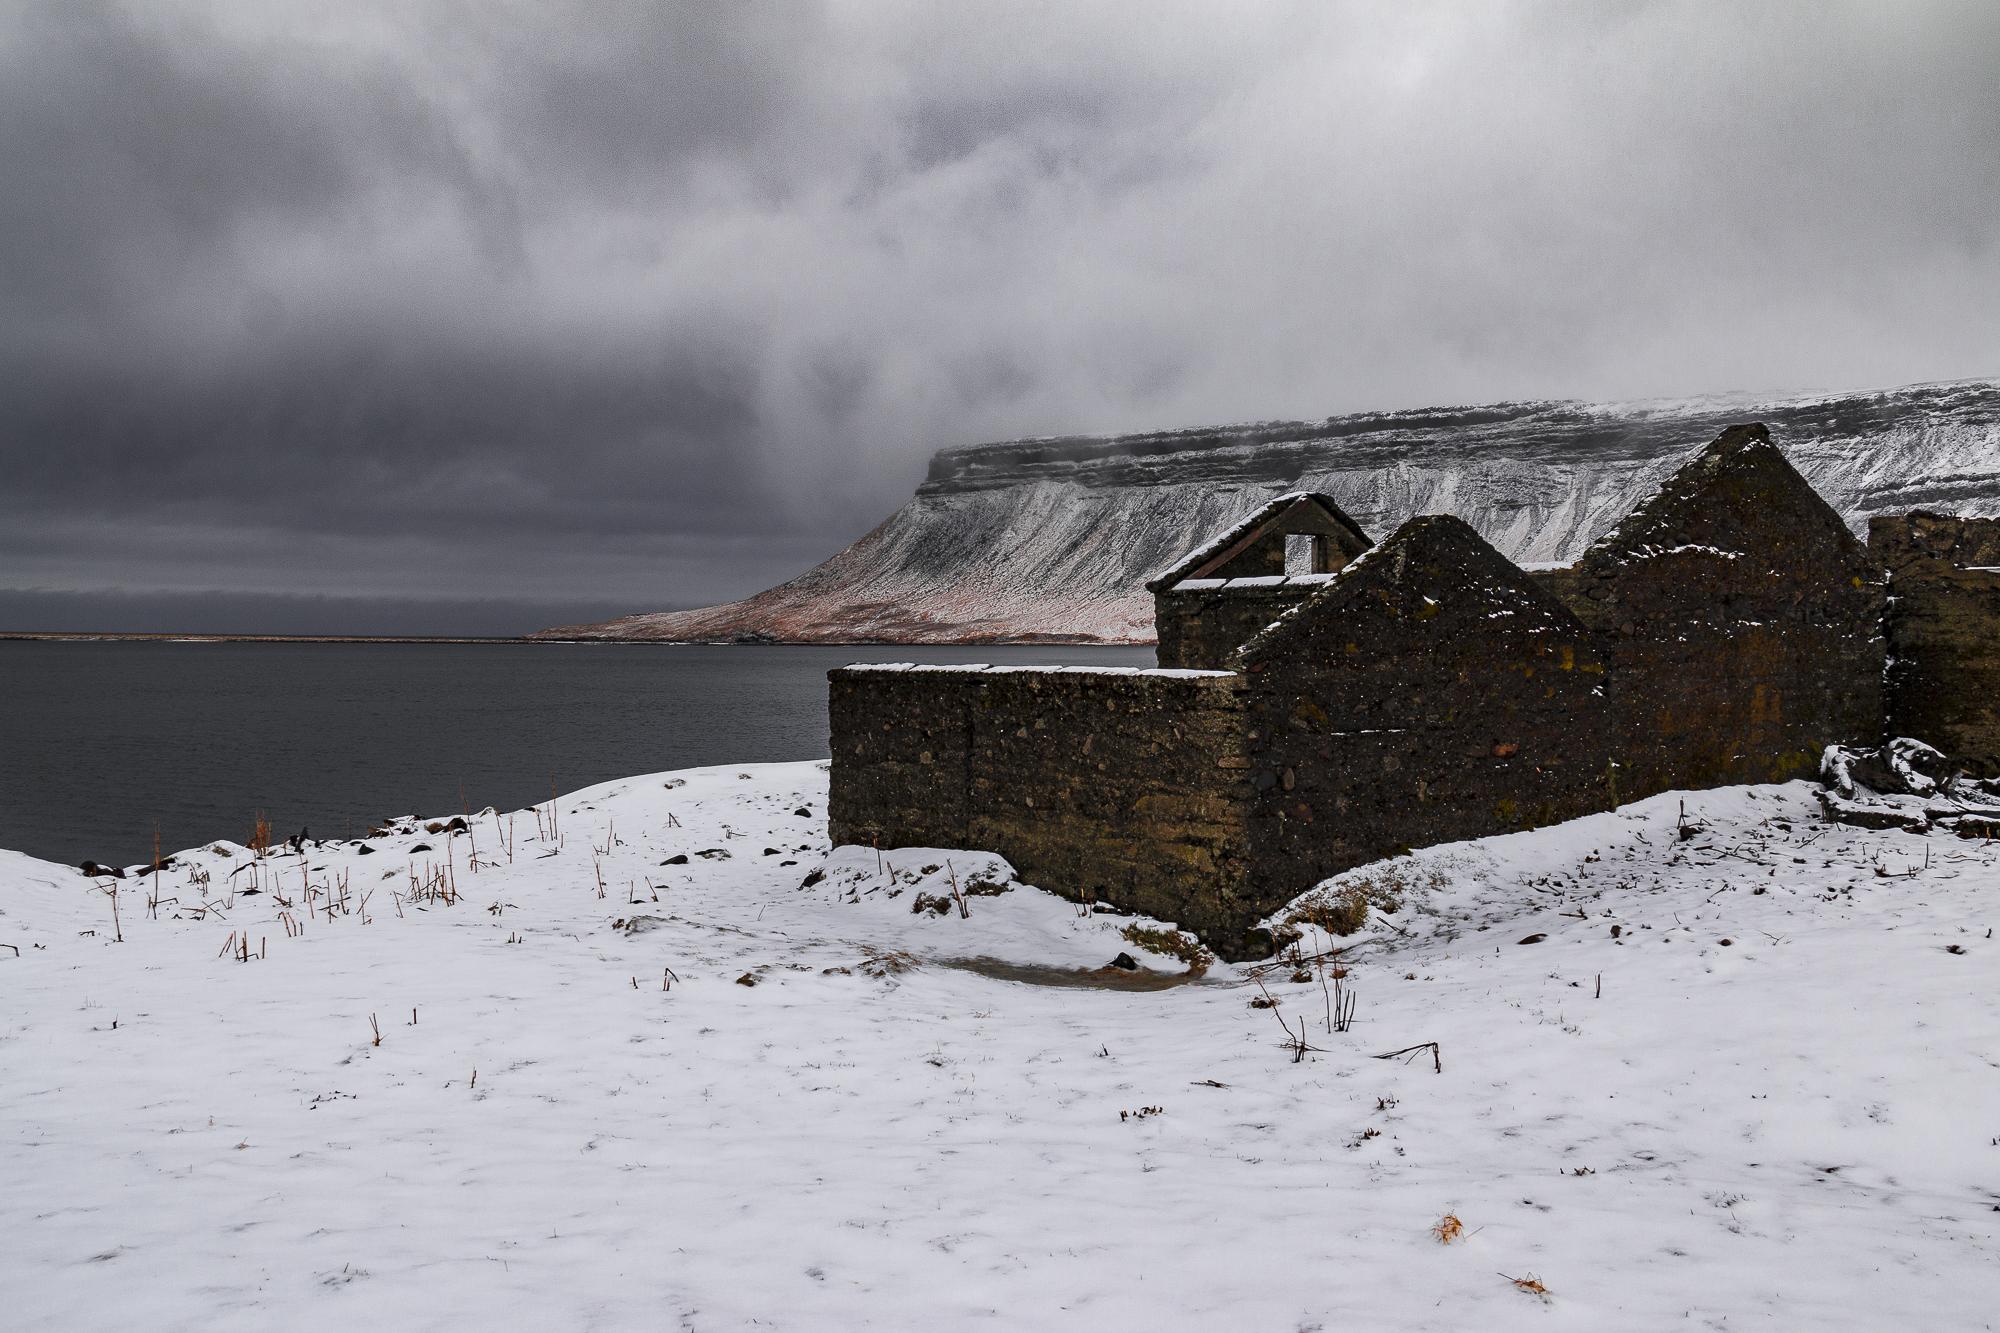 Ankit_Iceland-9821.jpg